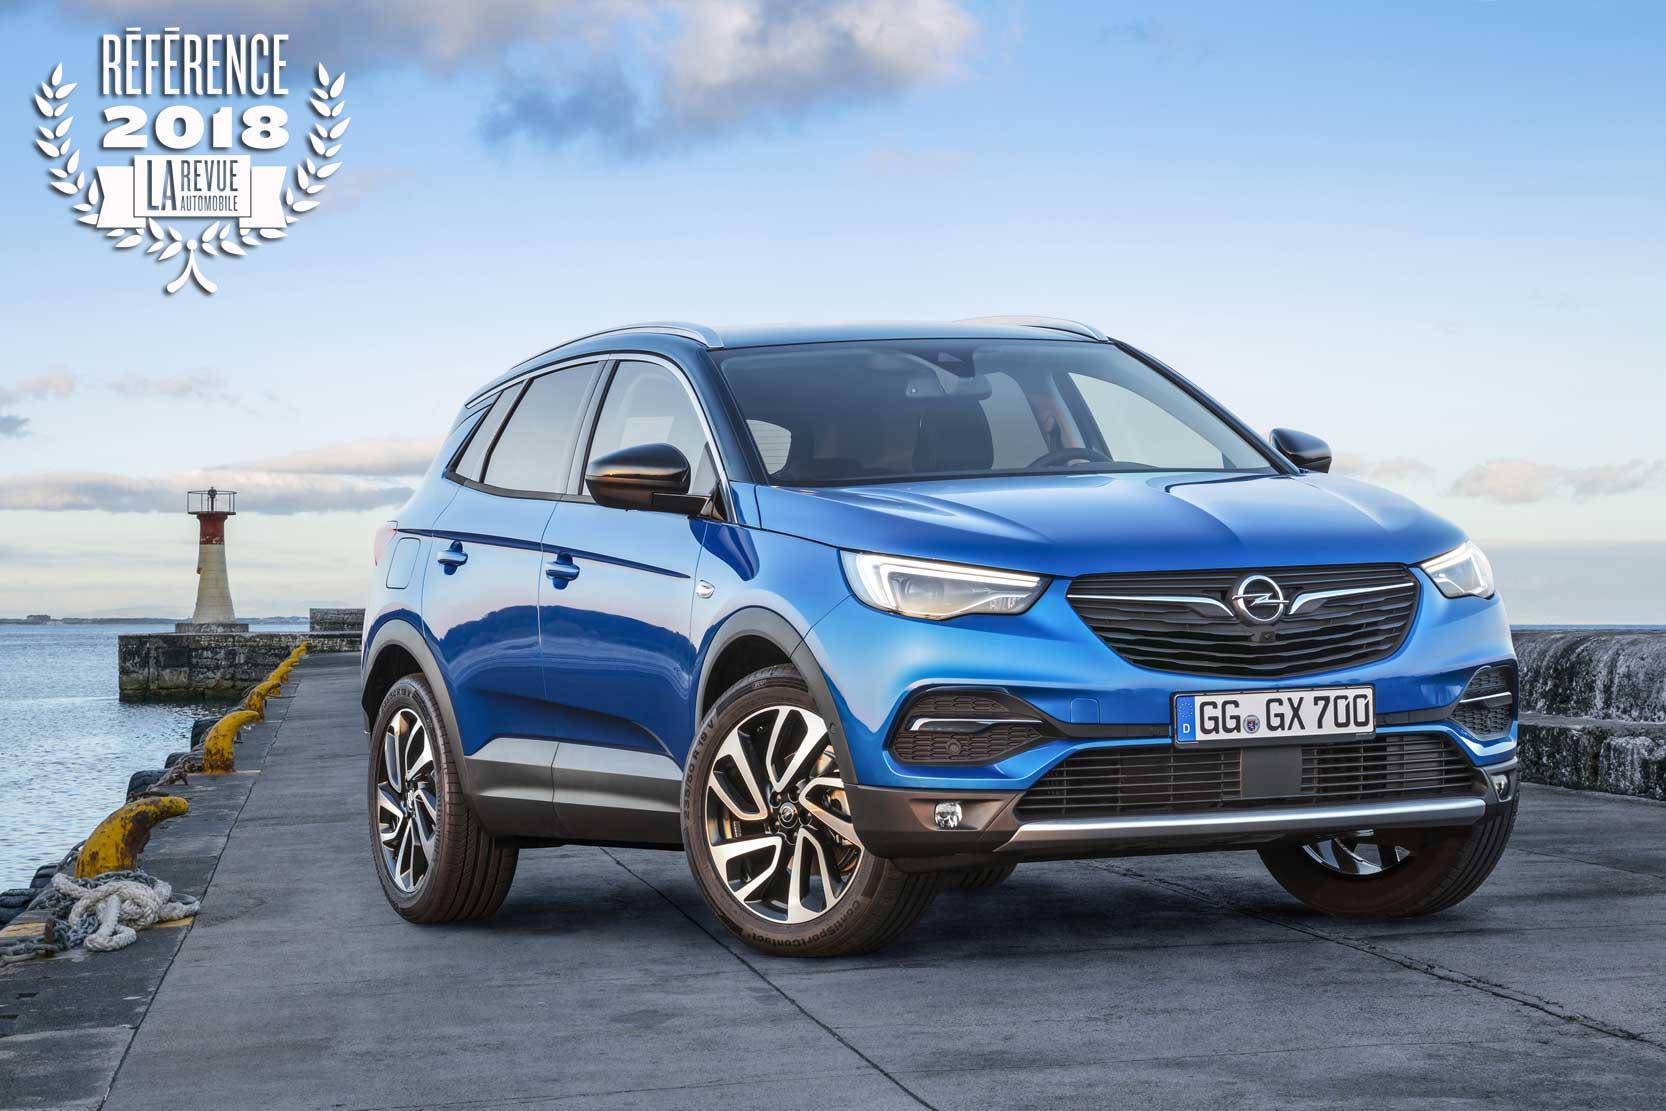 Le Meilleur Suv >> Photo Le Meilleur Suv Compact 2018 L Opel Grandland X